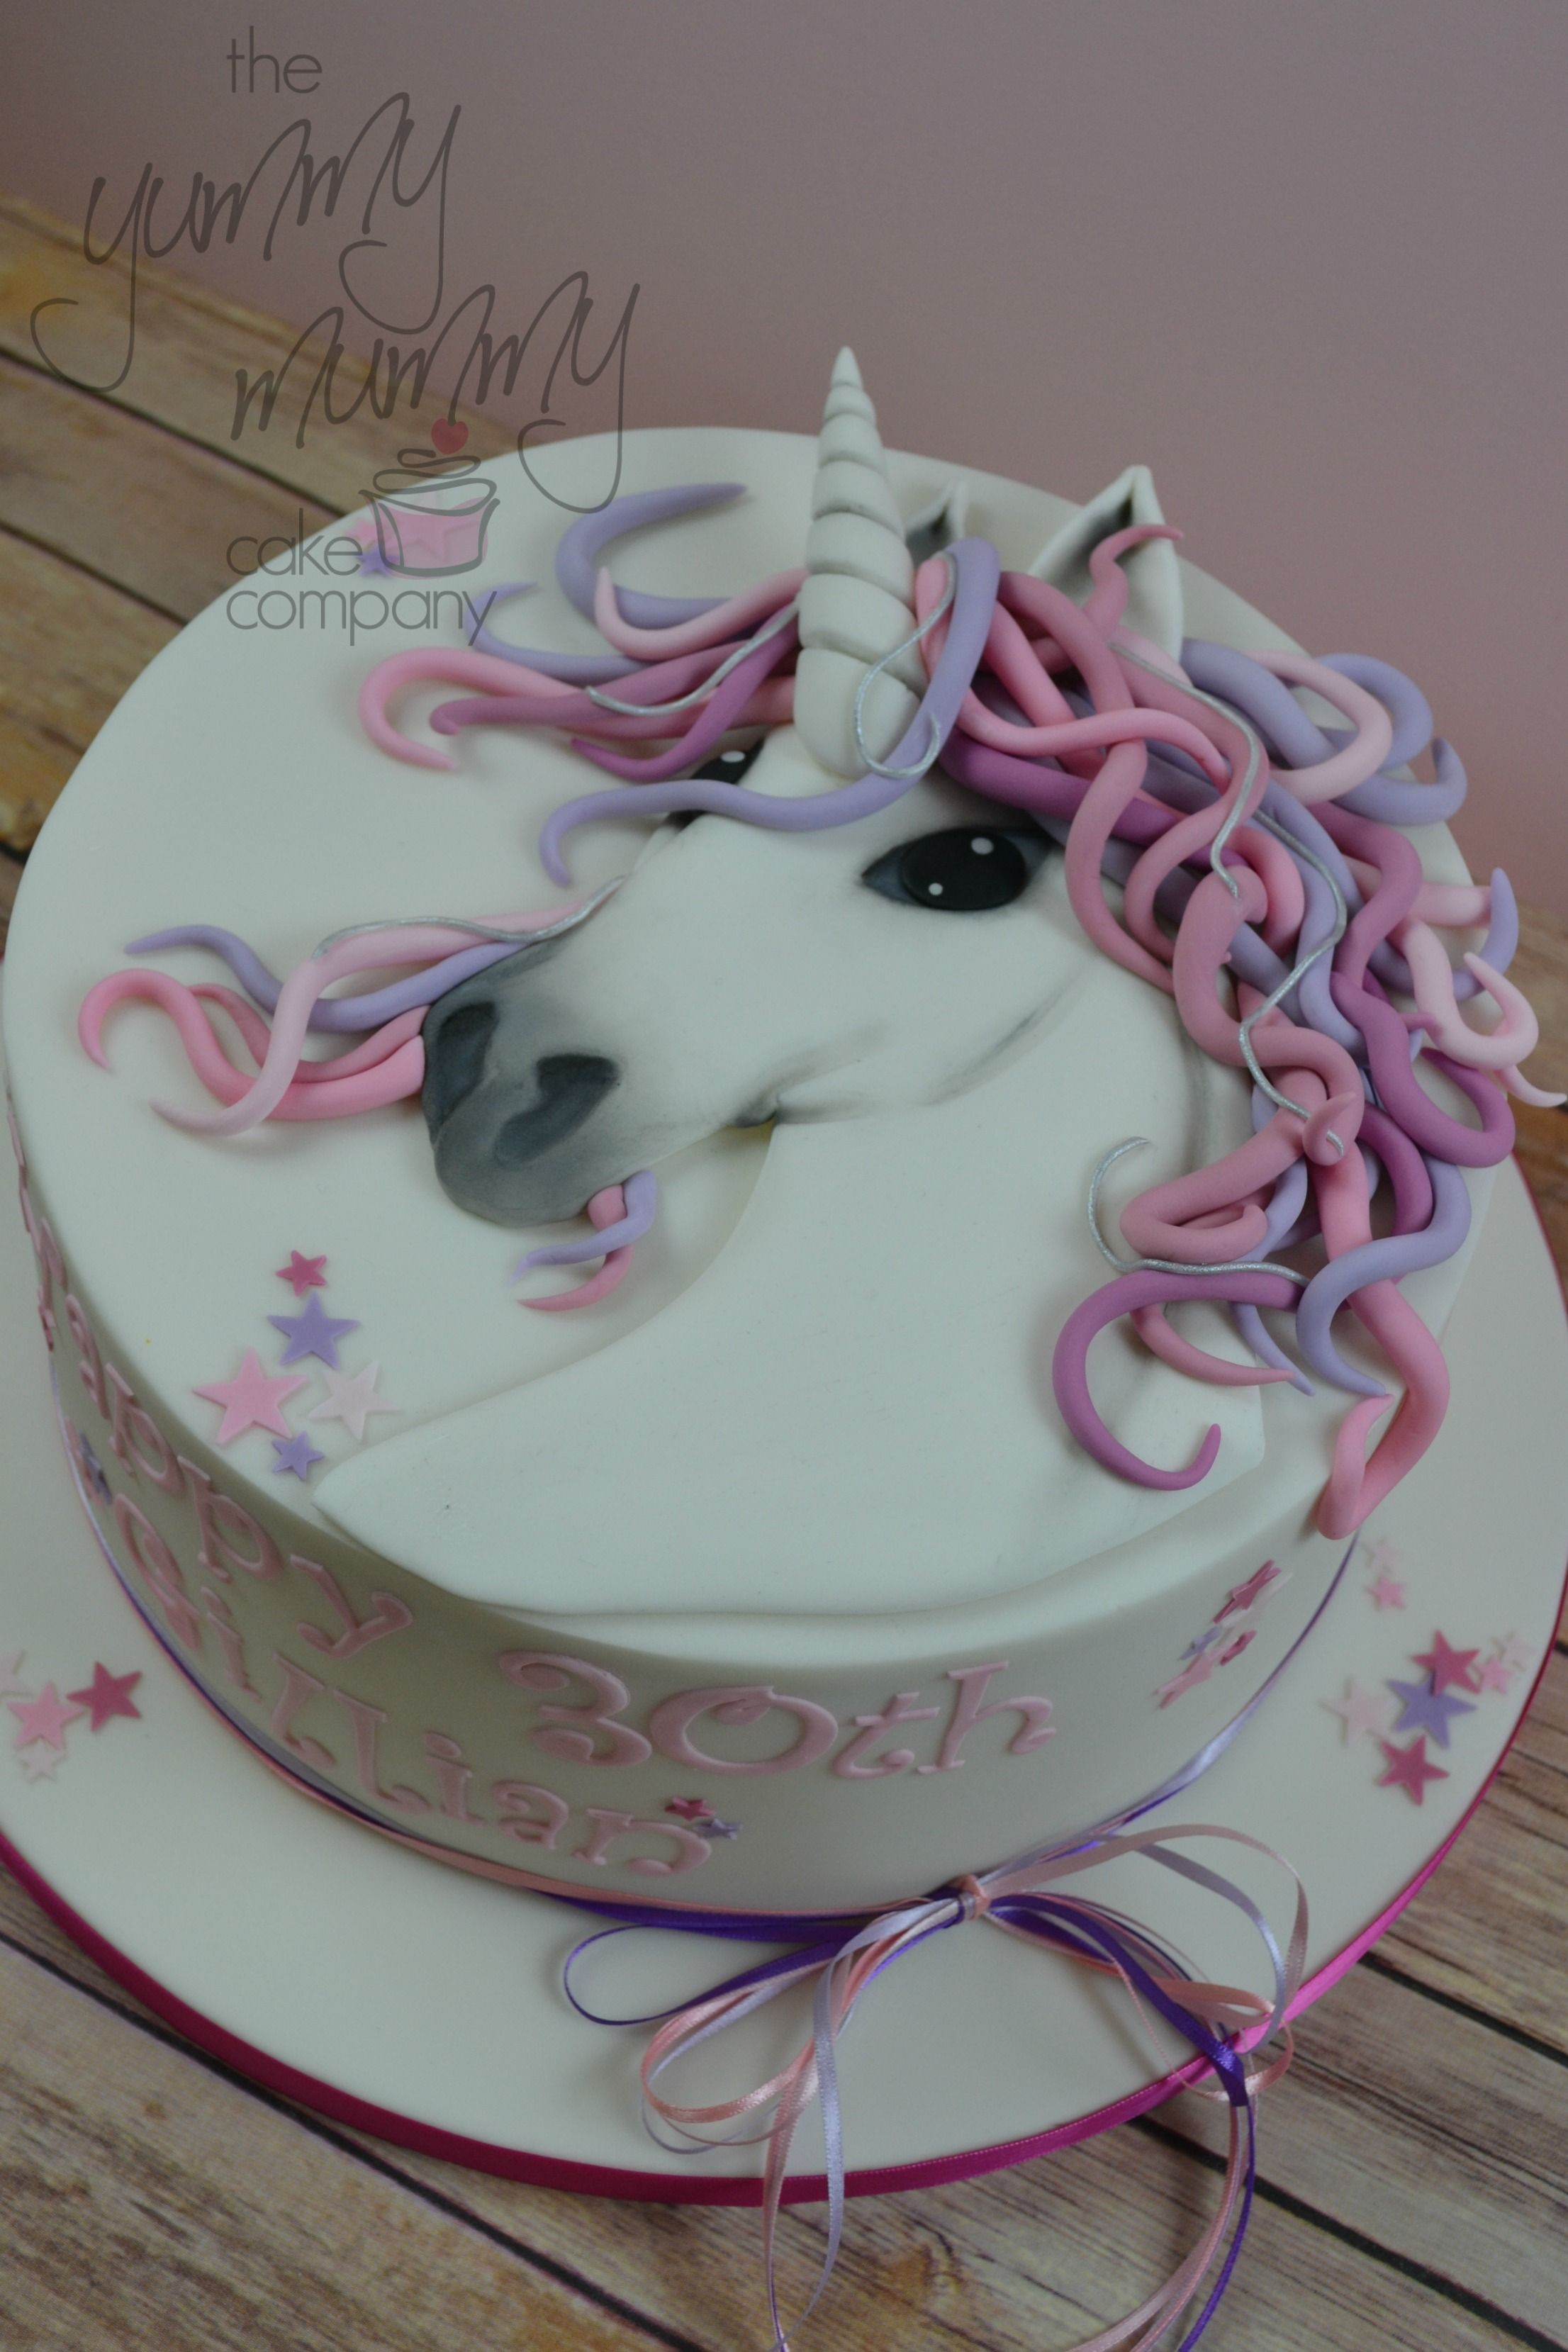 Unicorn Themed 30th Birthday Cake From The Yummy Mummy Company